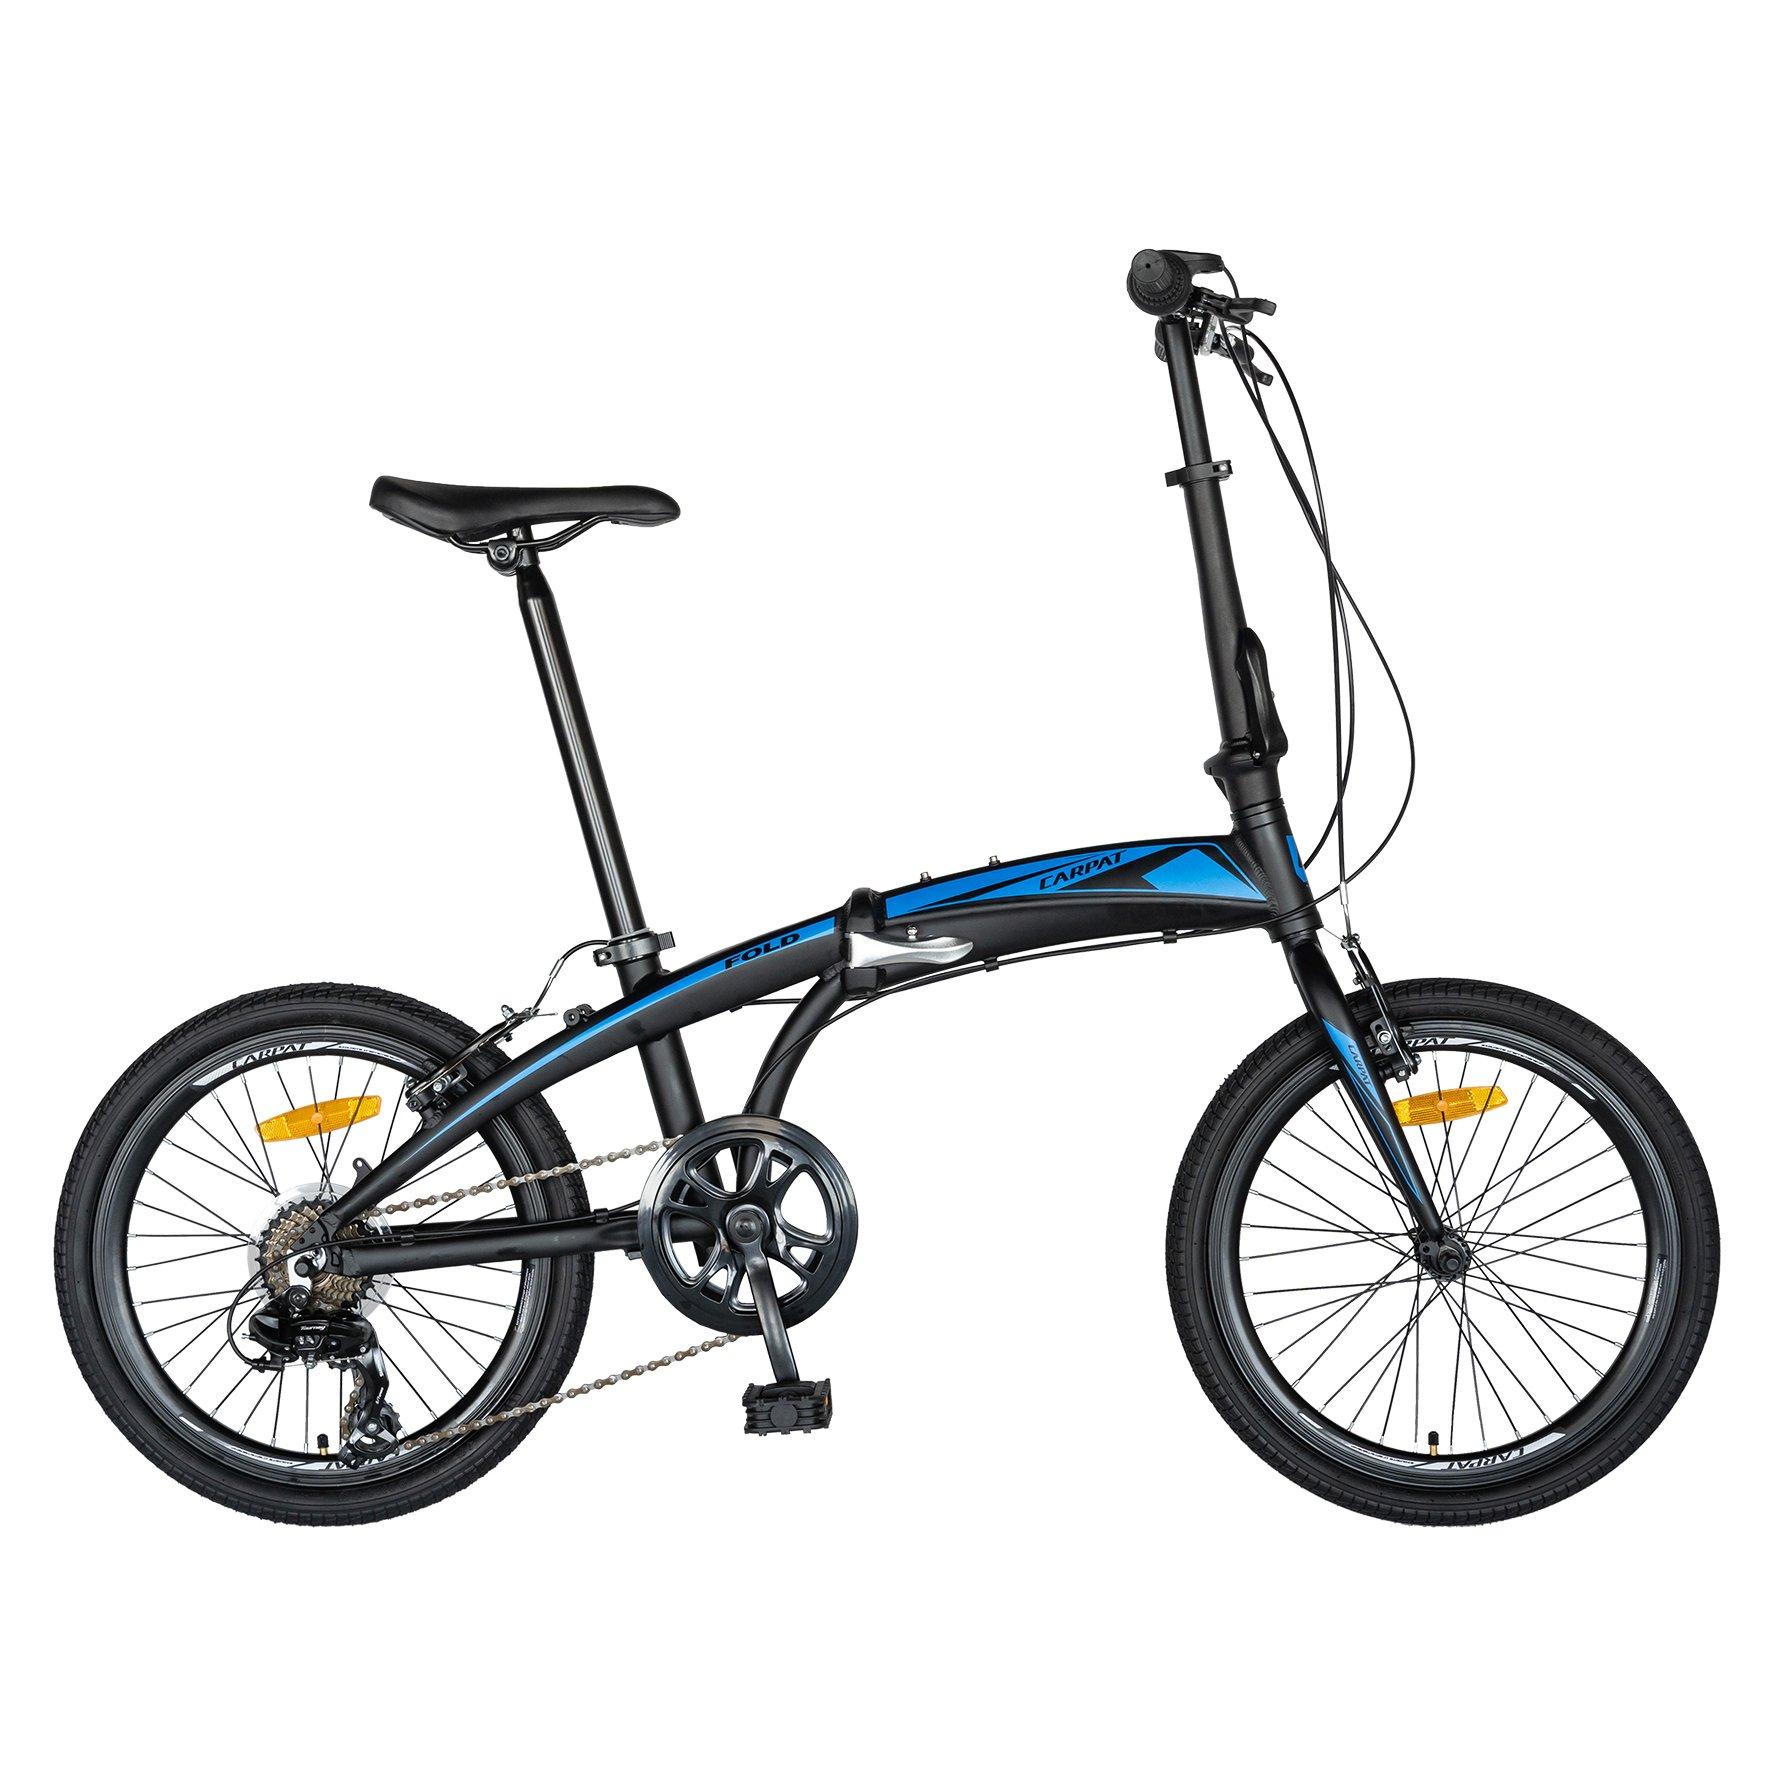 Fotografie Bicicleta pliabila, C2052C, cadru aluminiu, transmisie Shimano, Negru/Albastru